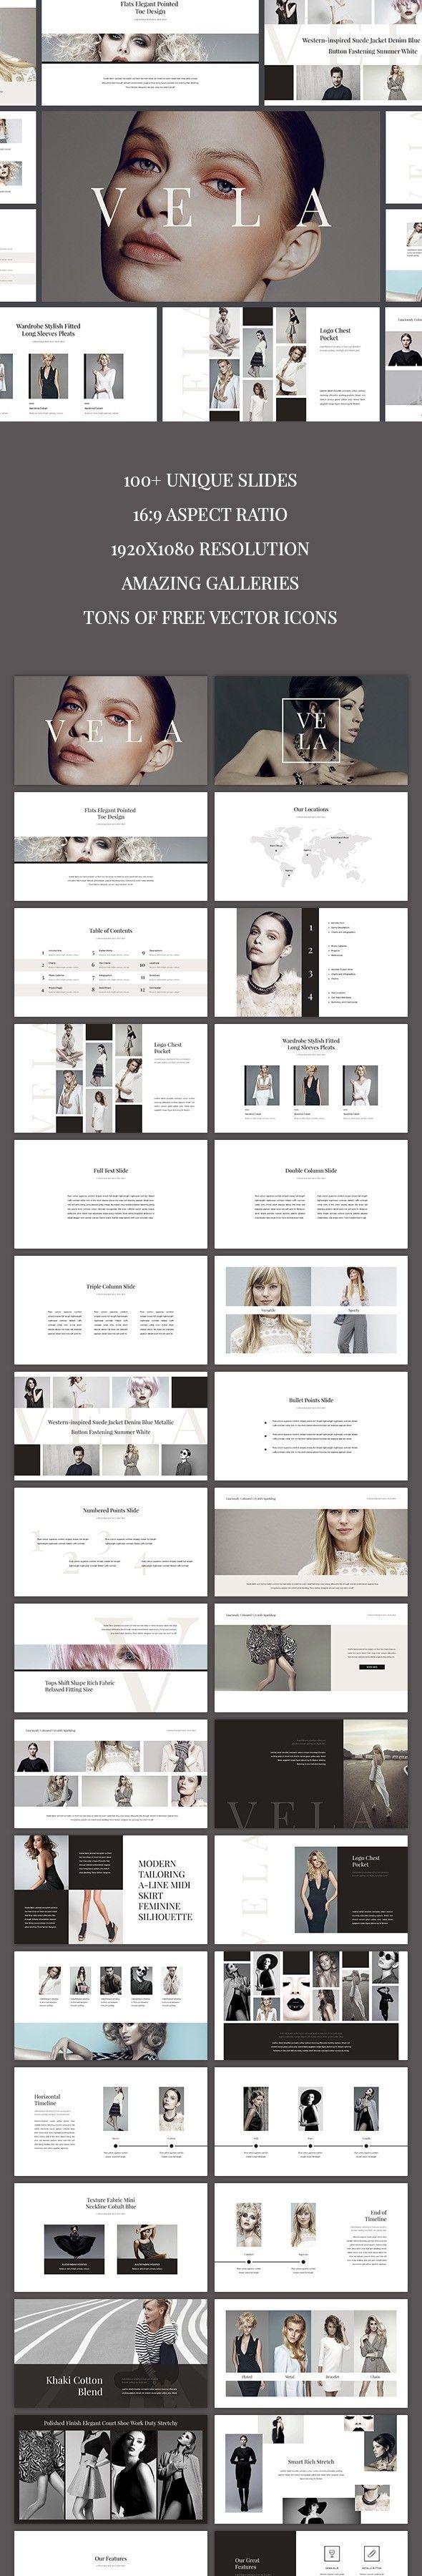 Advertisement Agency Best Powerpoint Templates Branding Chic